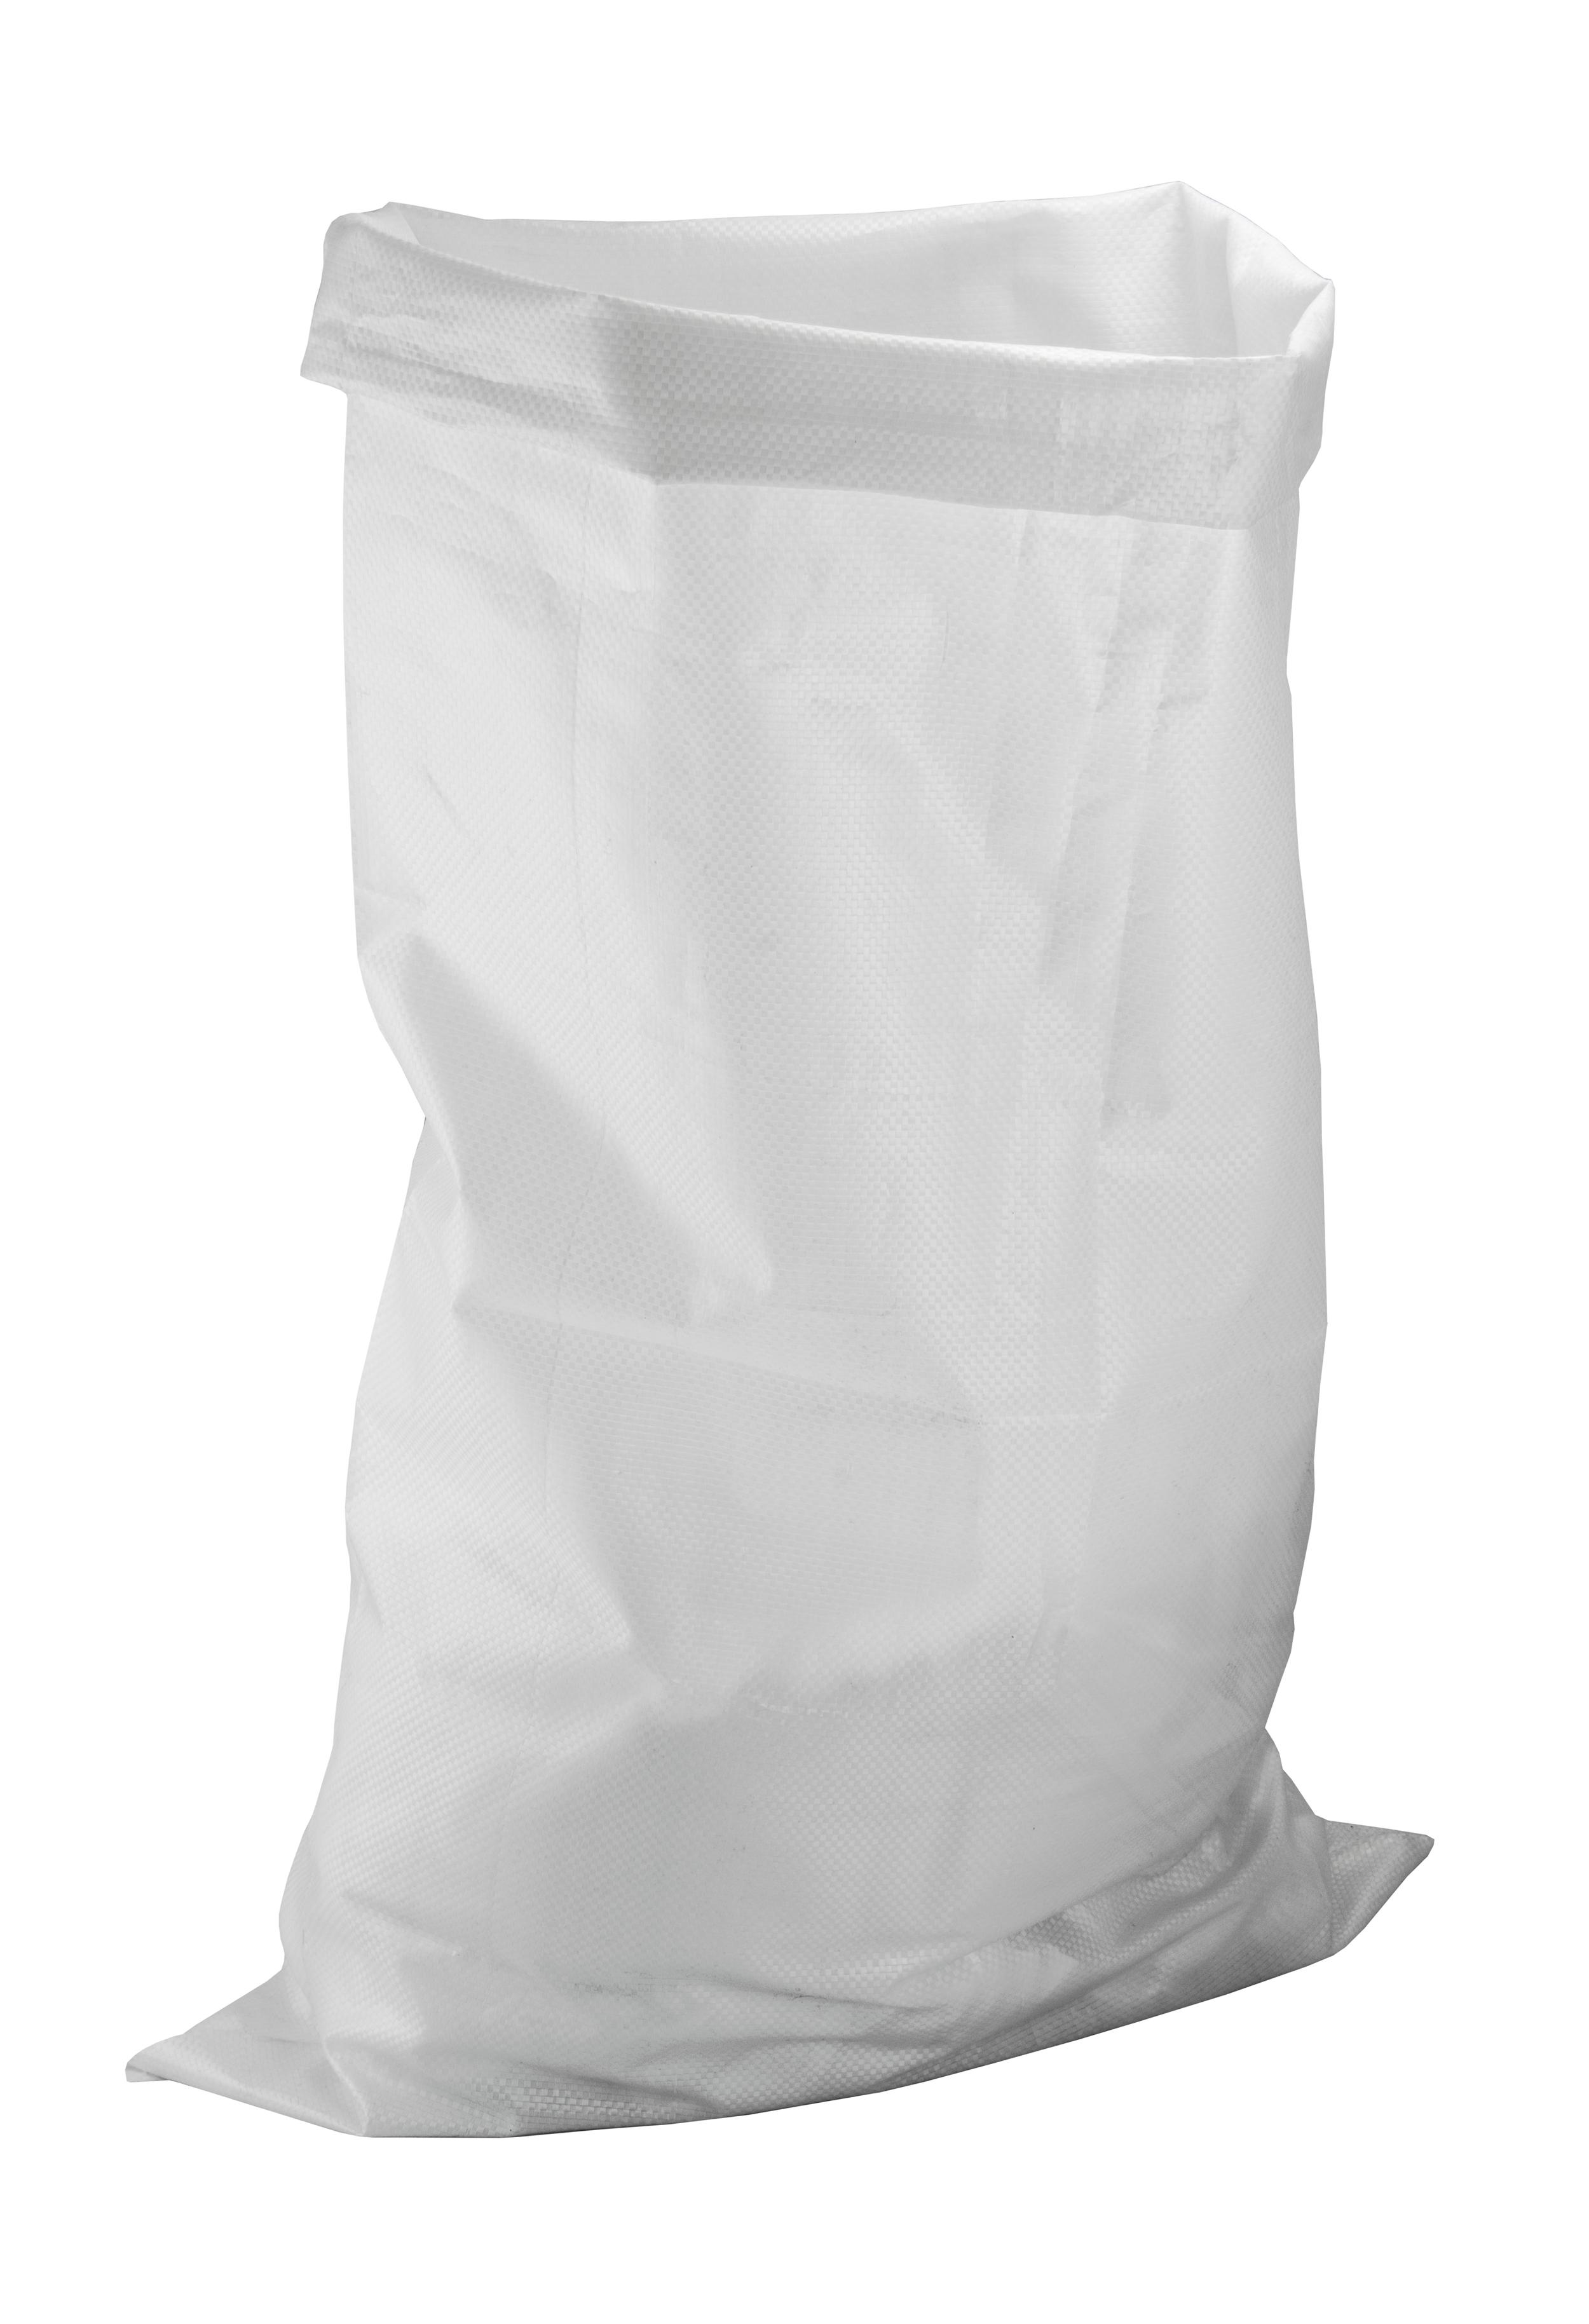 Stavebné vrece PP, 65x100 cm, 65 g/m2, biele, 110 L